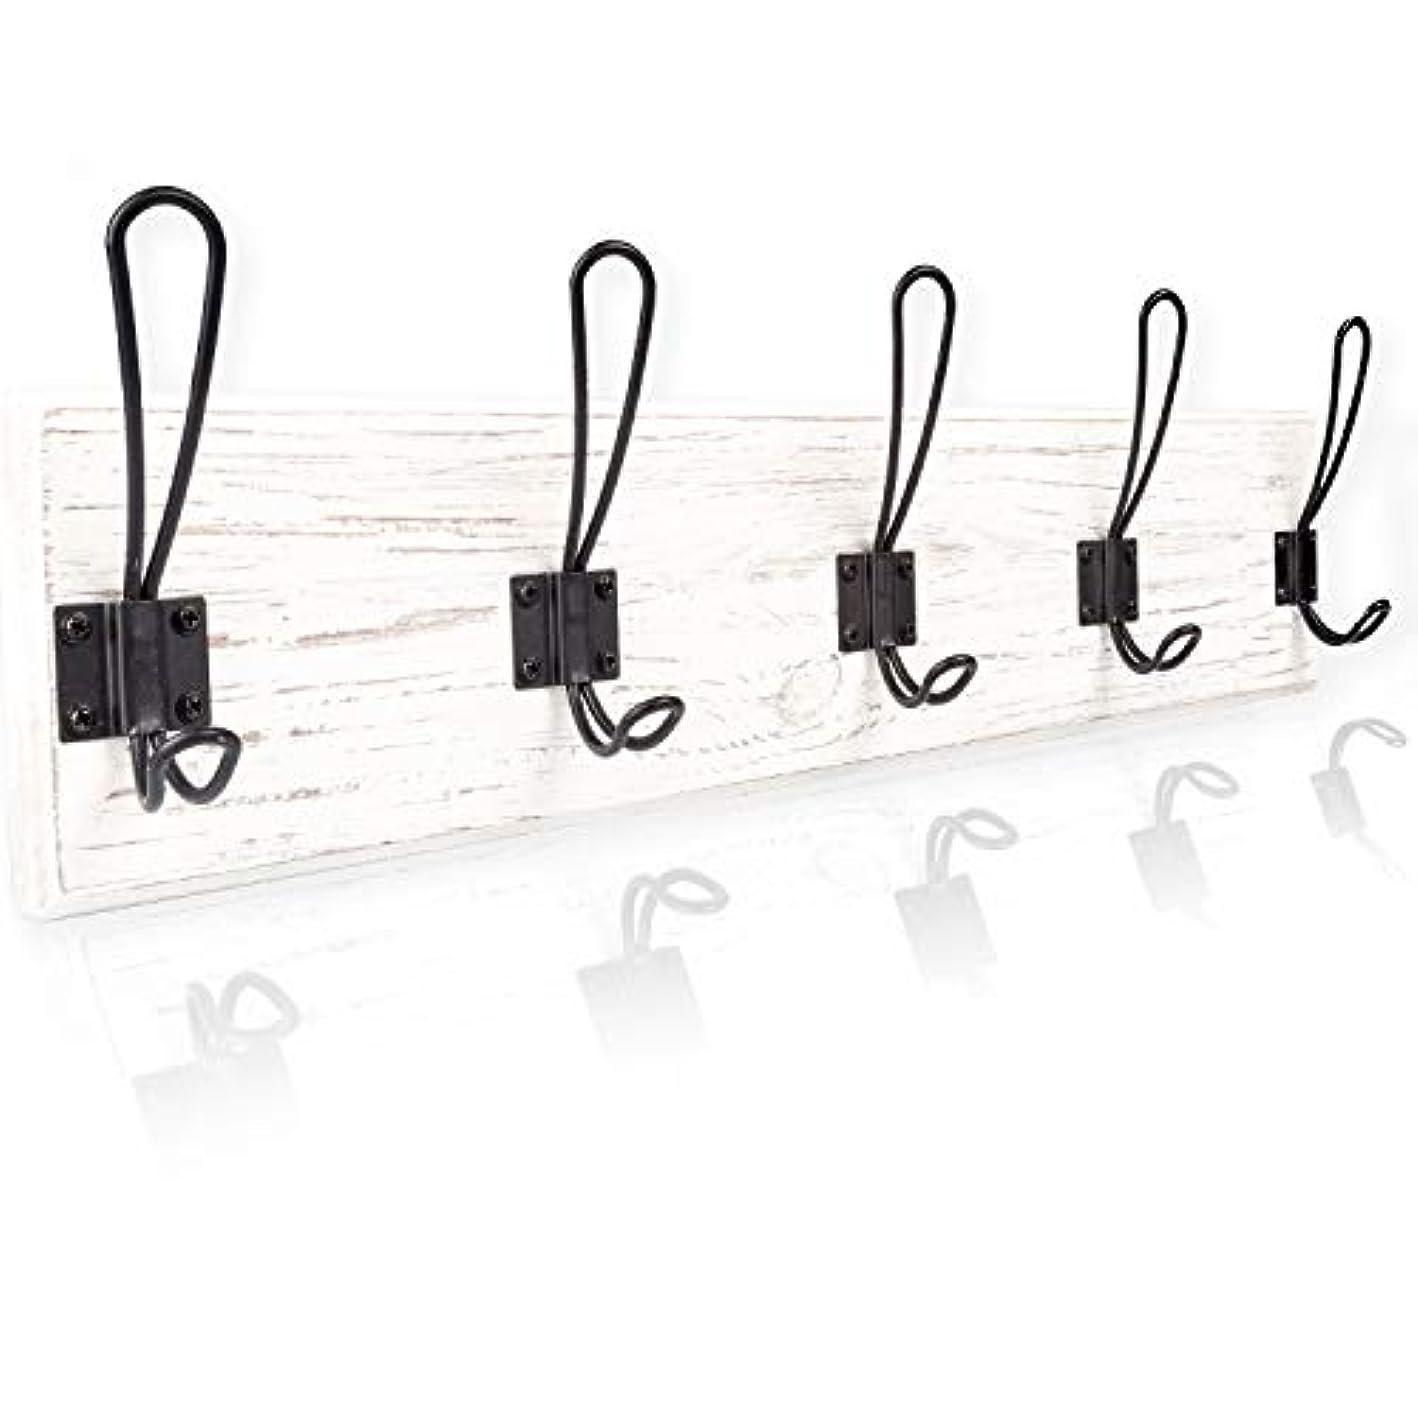 Wall Mounted Coat Rack - Rustic Wooden 5 Hook Coat Hanger Rail, White Distressed Wood, Black Metal Hooks